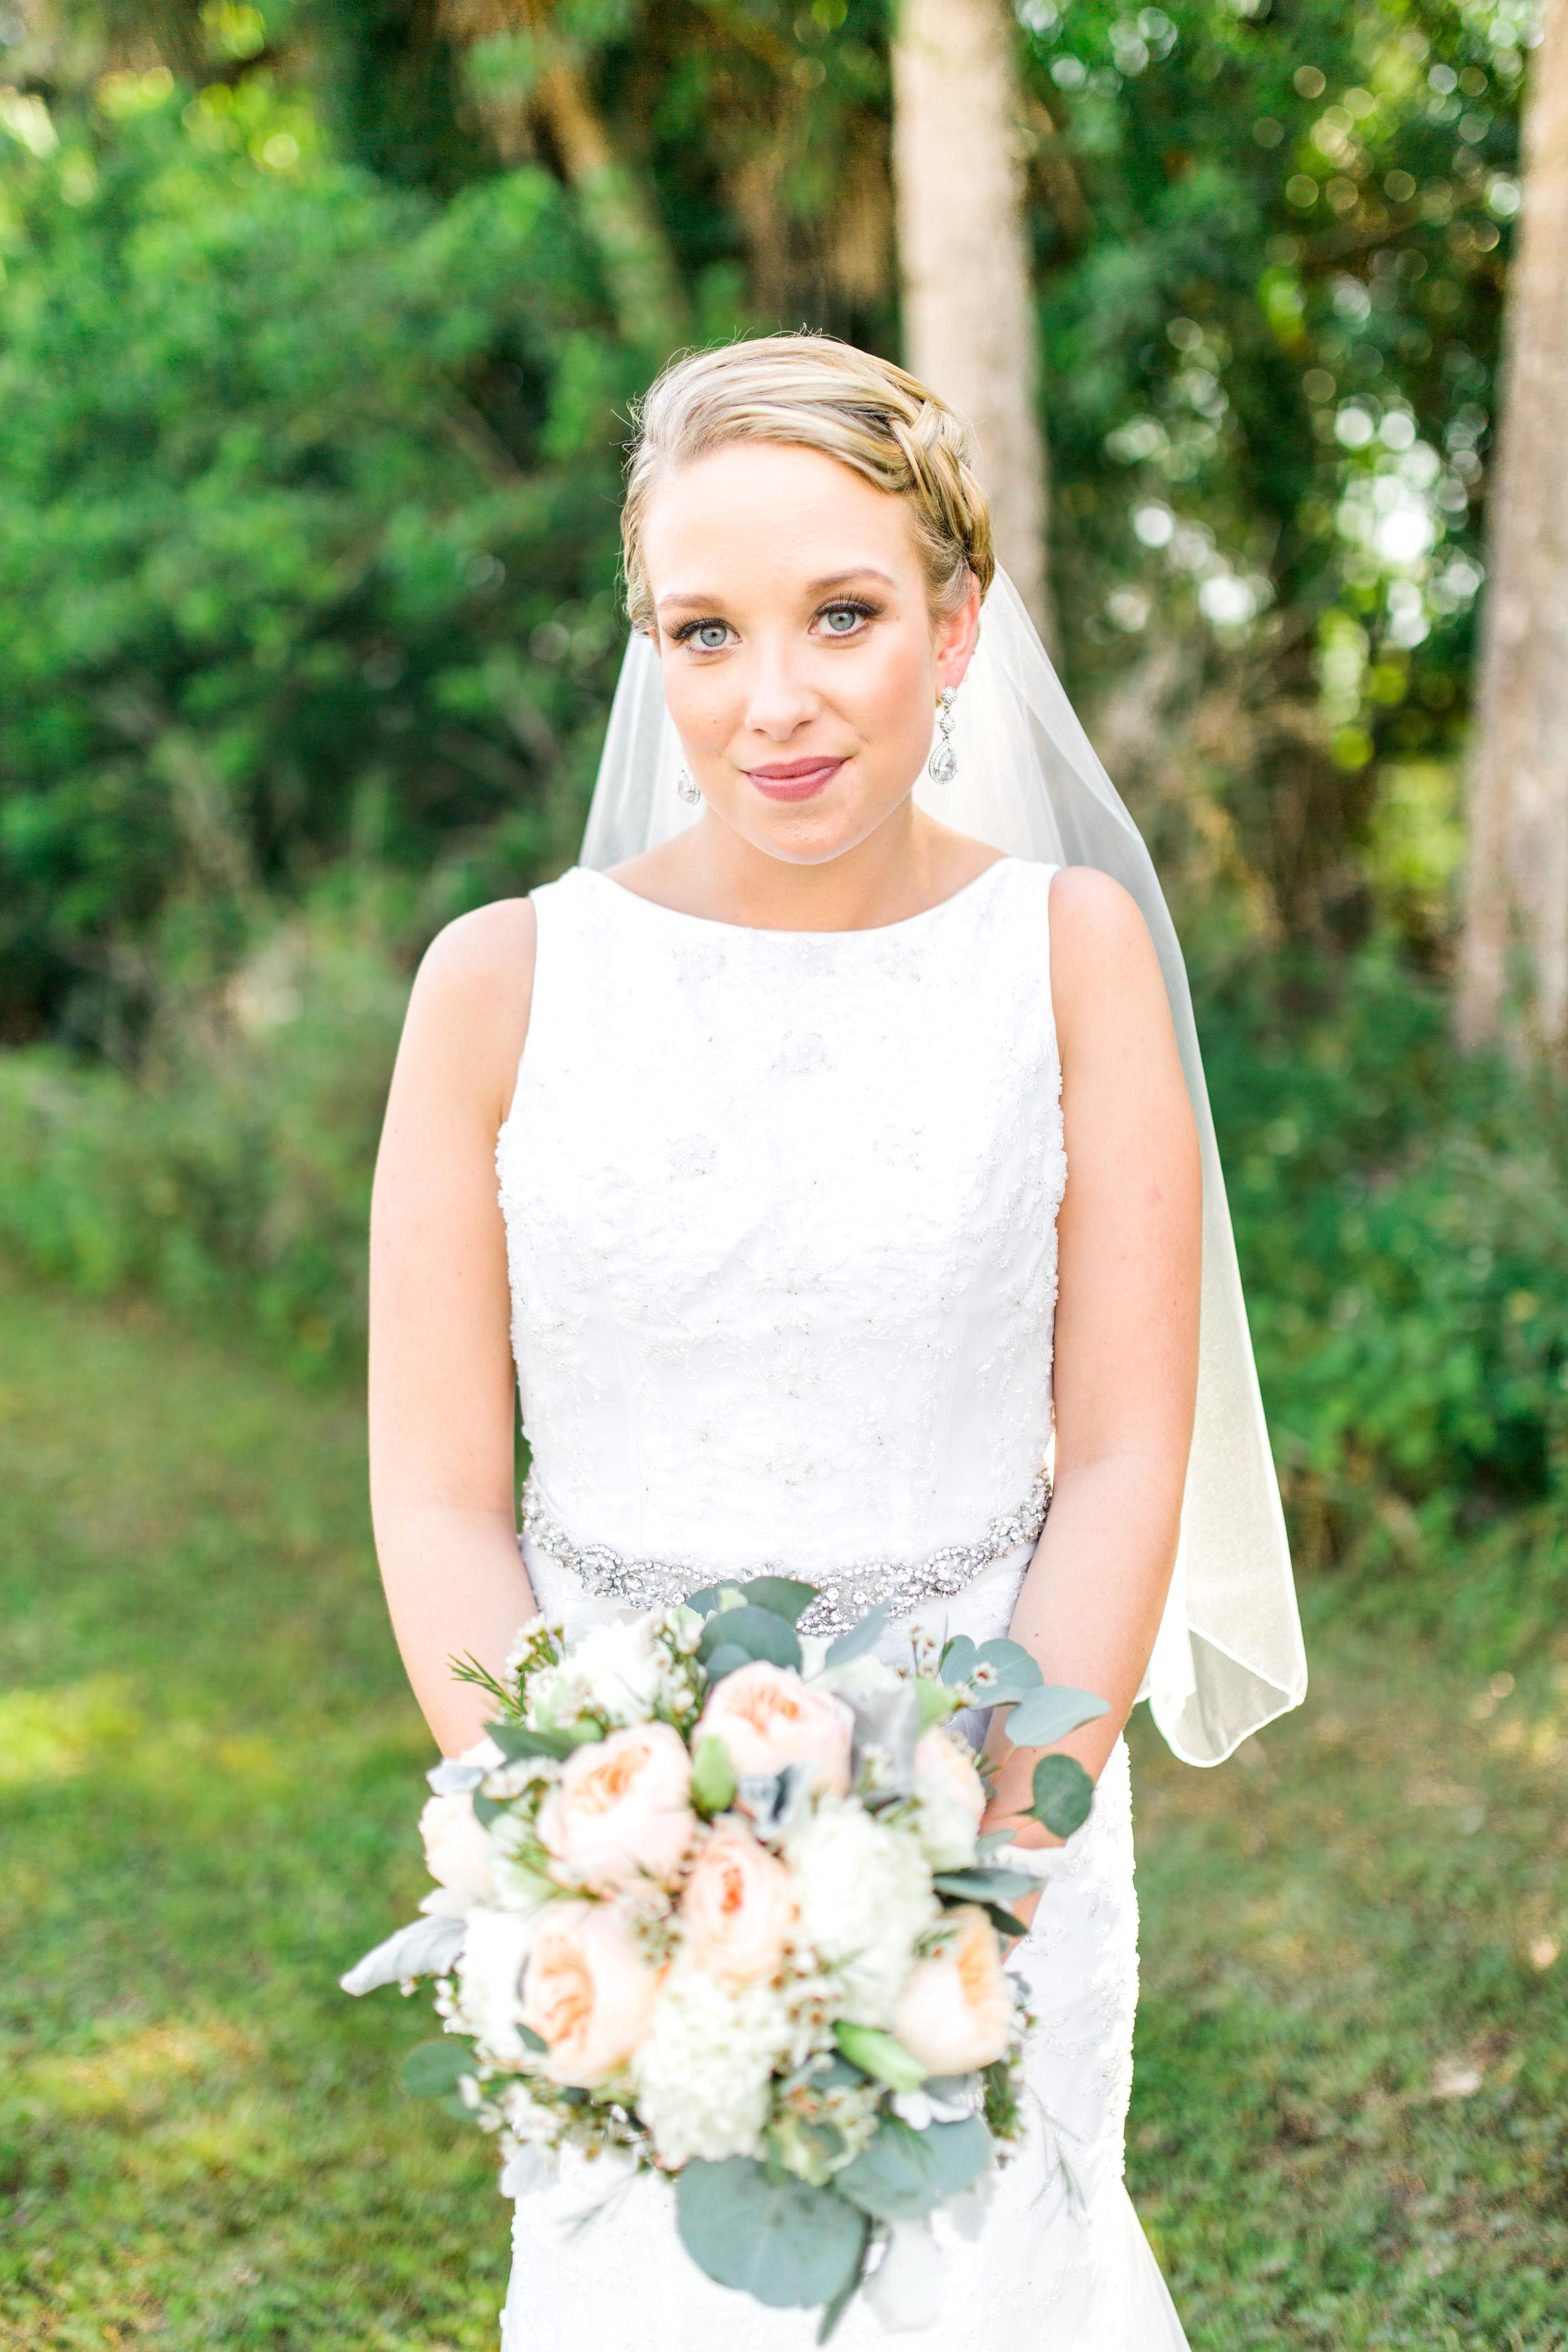 Sterling stables, brevard county FL wedding bride  photo